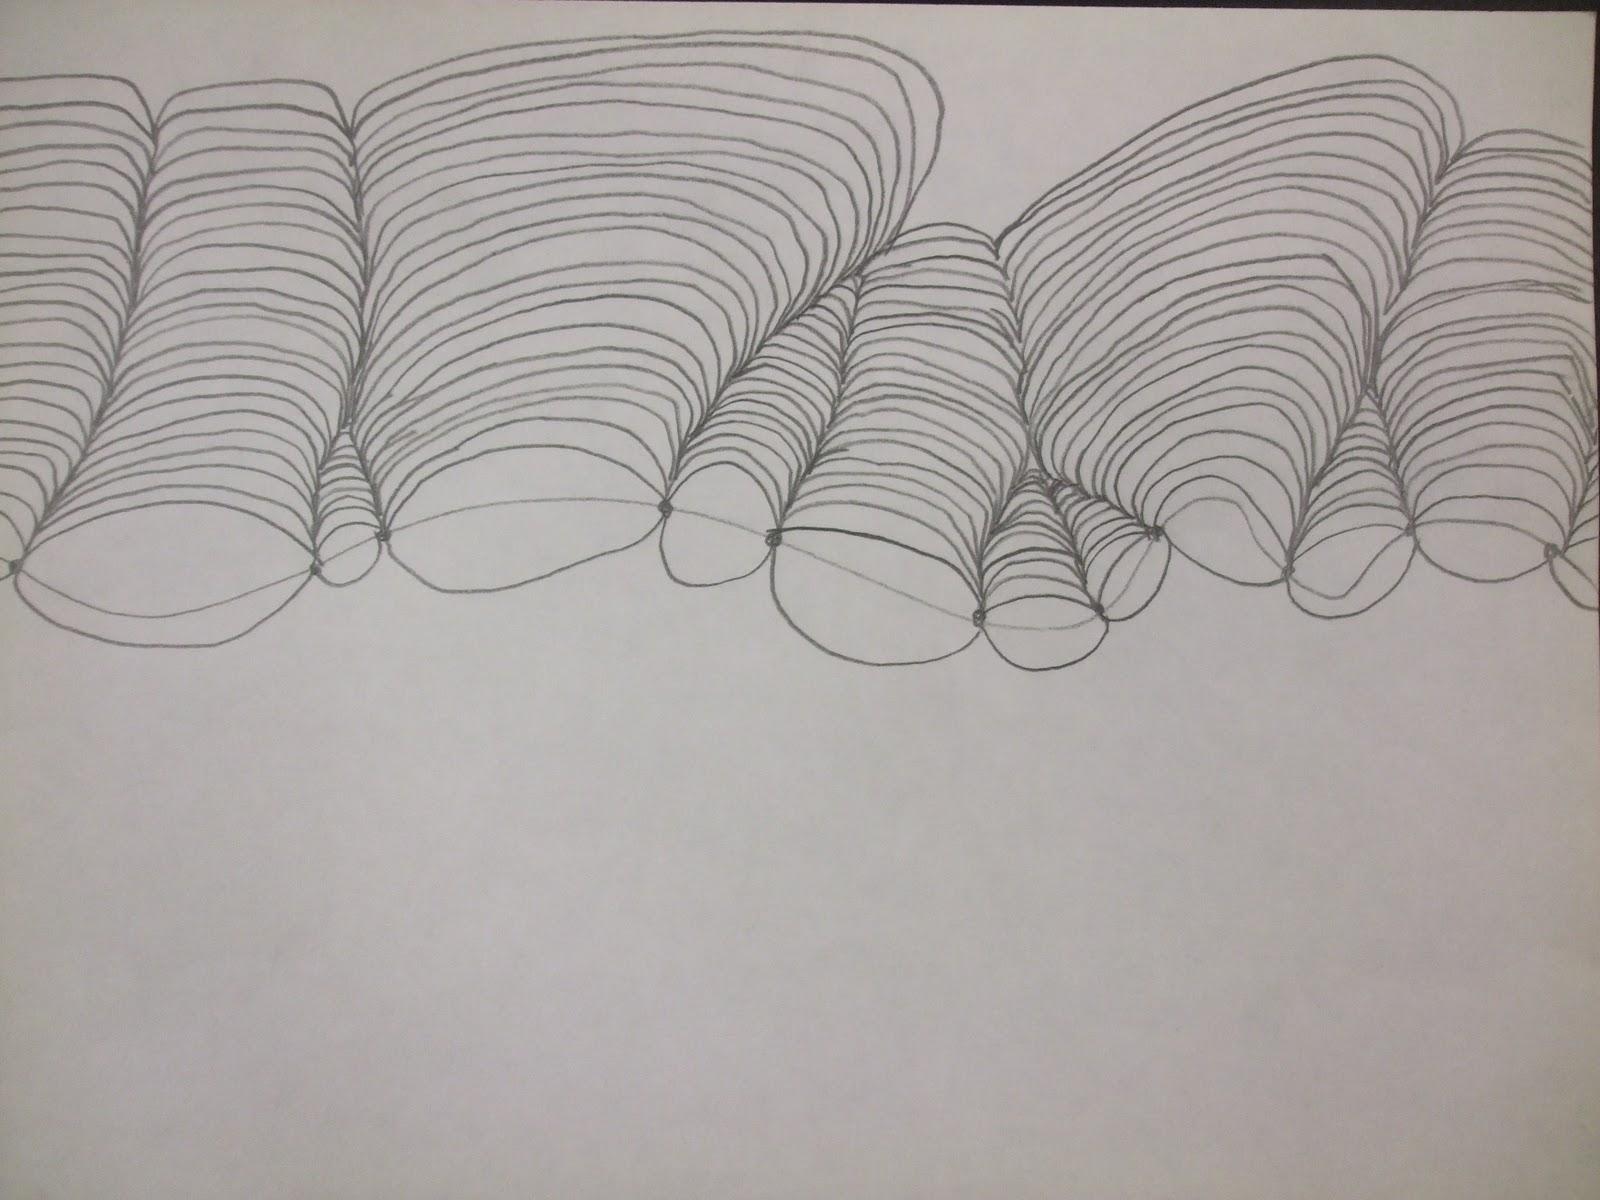 3d Line Design : Rainbow skies dragonflies d tornado line designs th grade